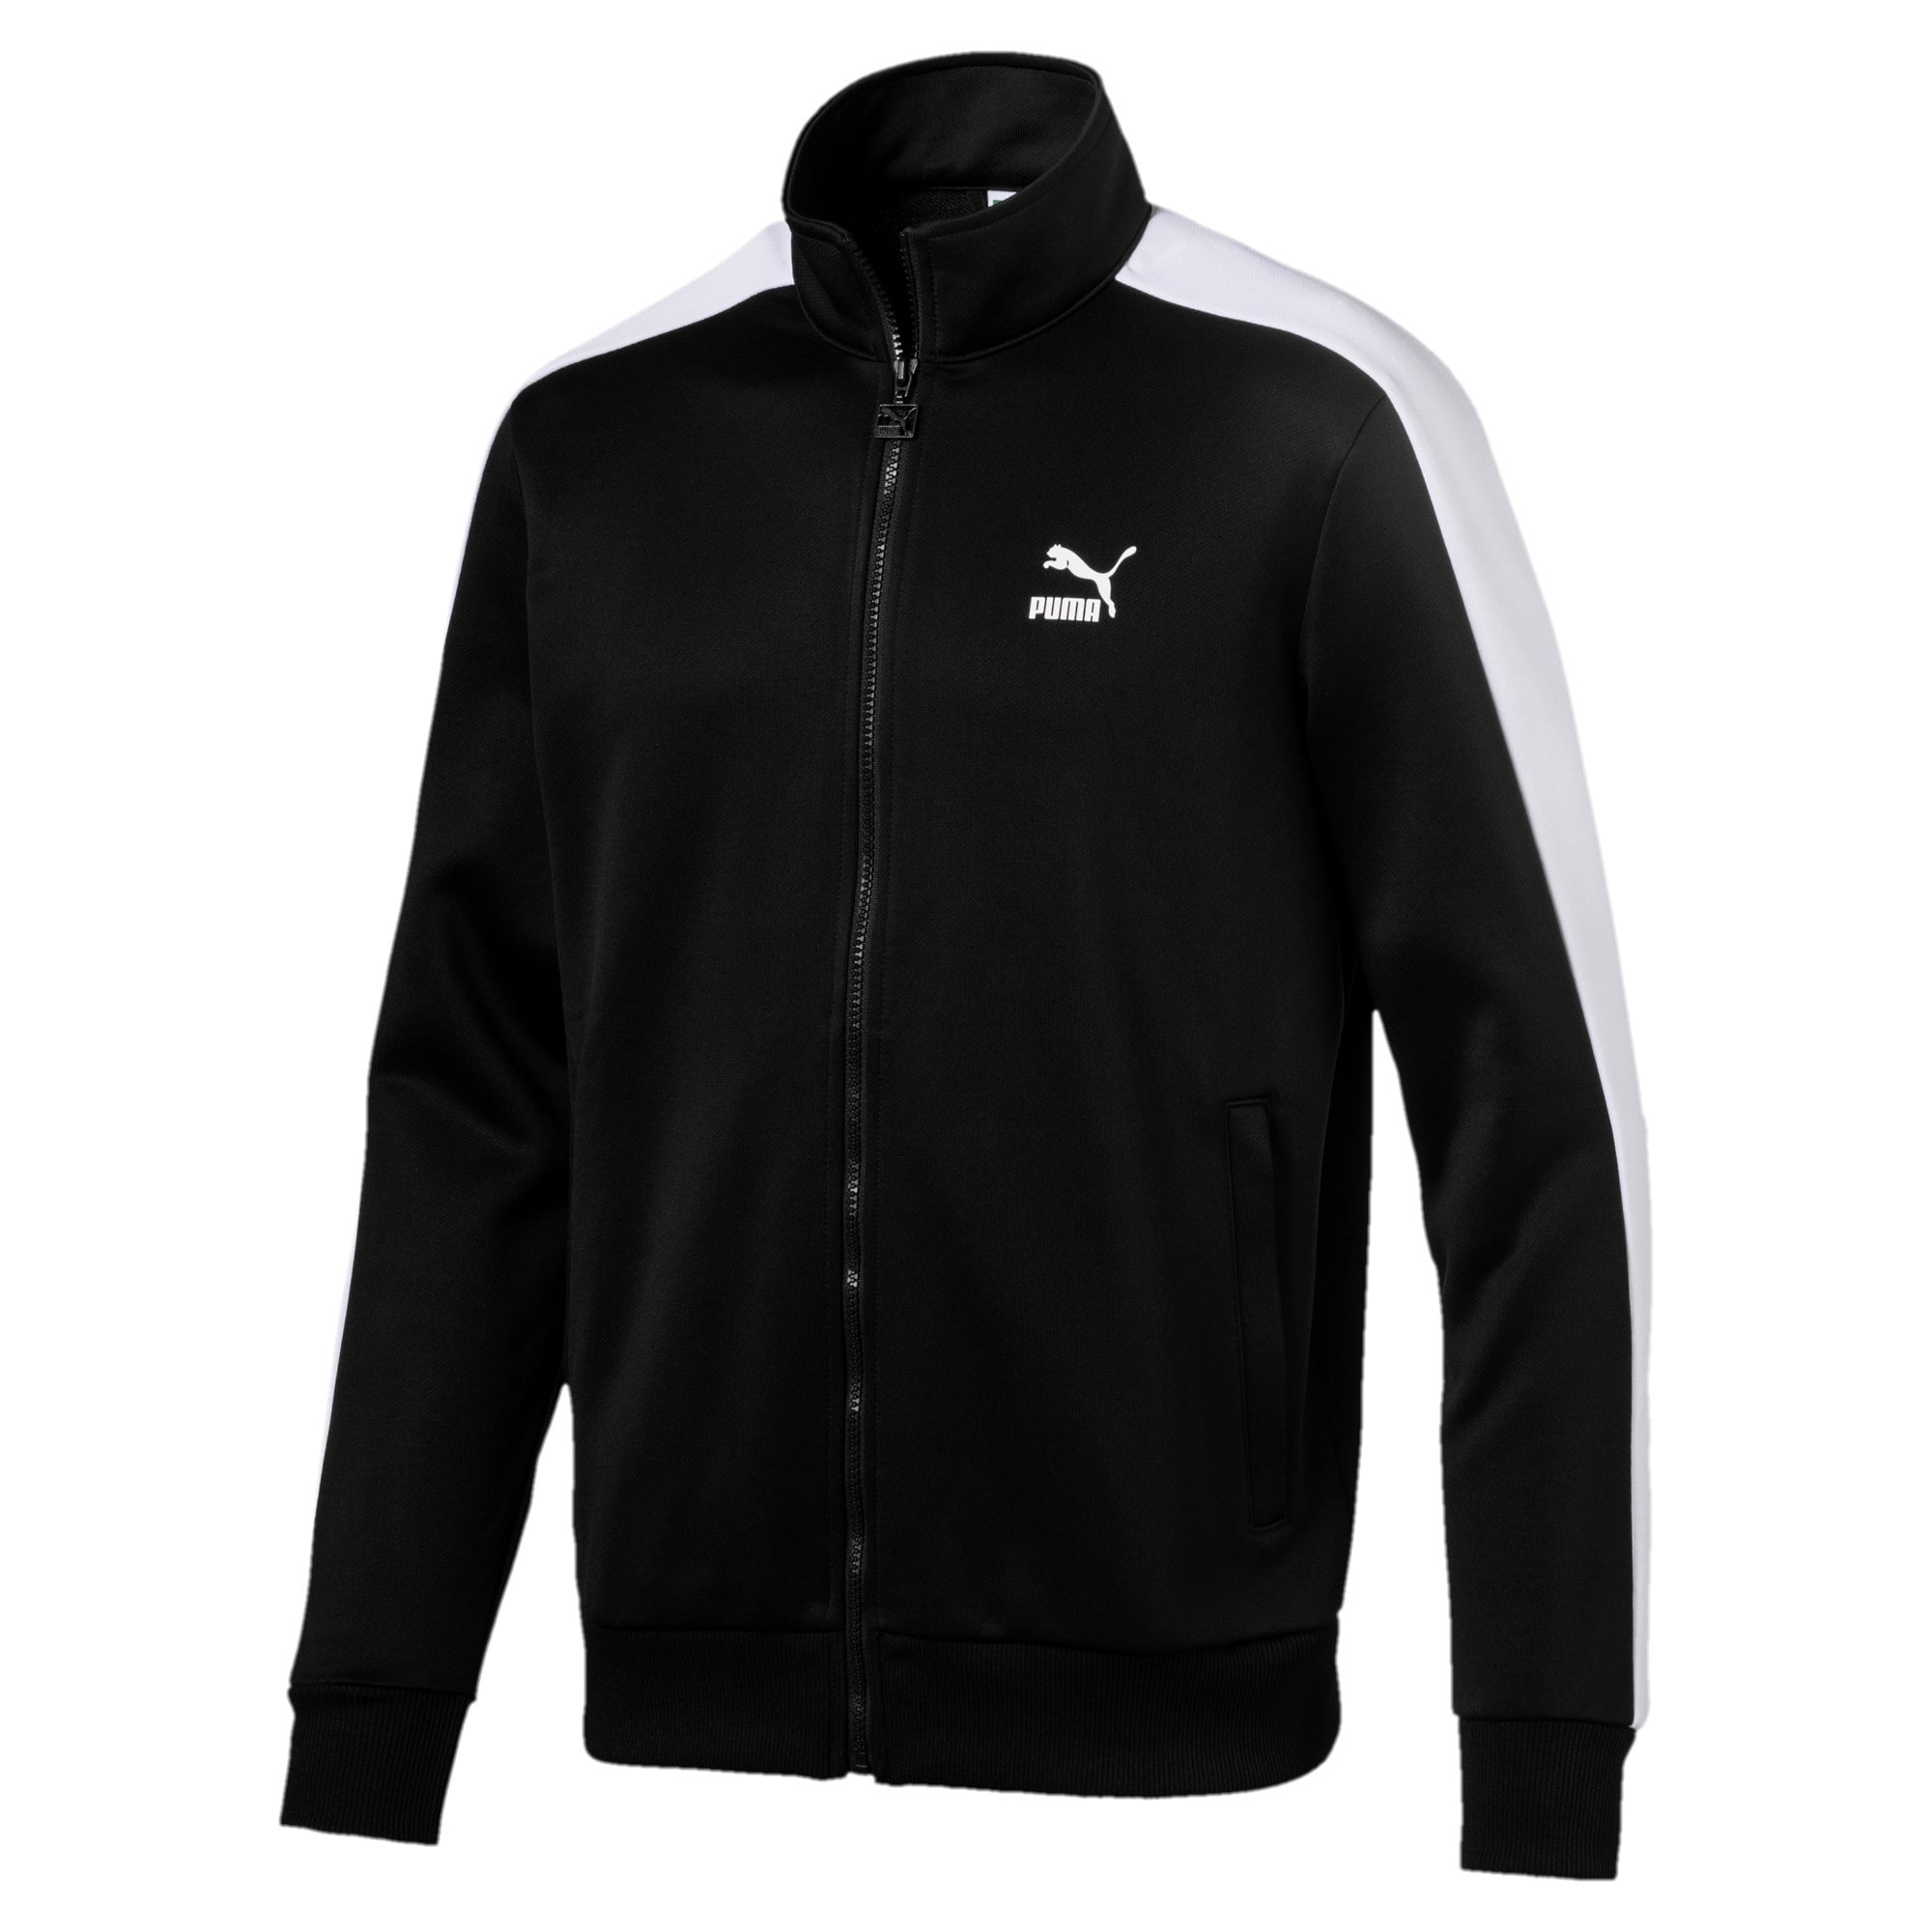 Thumbnail 4 of Archive Men's T7 Track Jacket, Puma Black, medium-IND